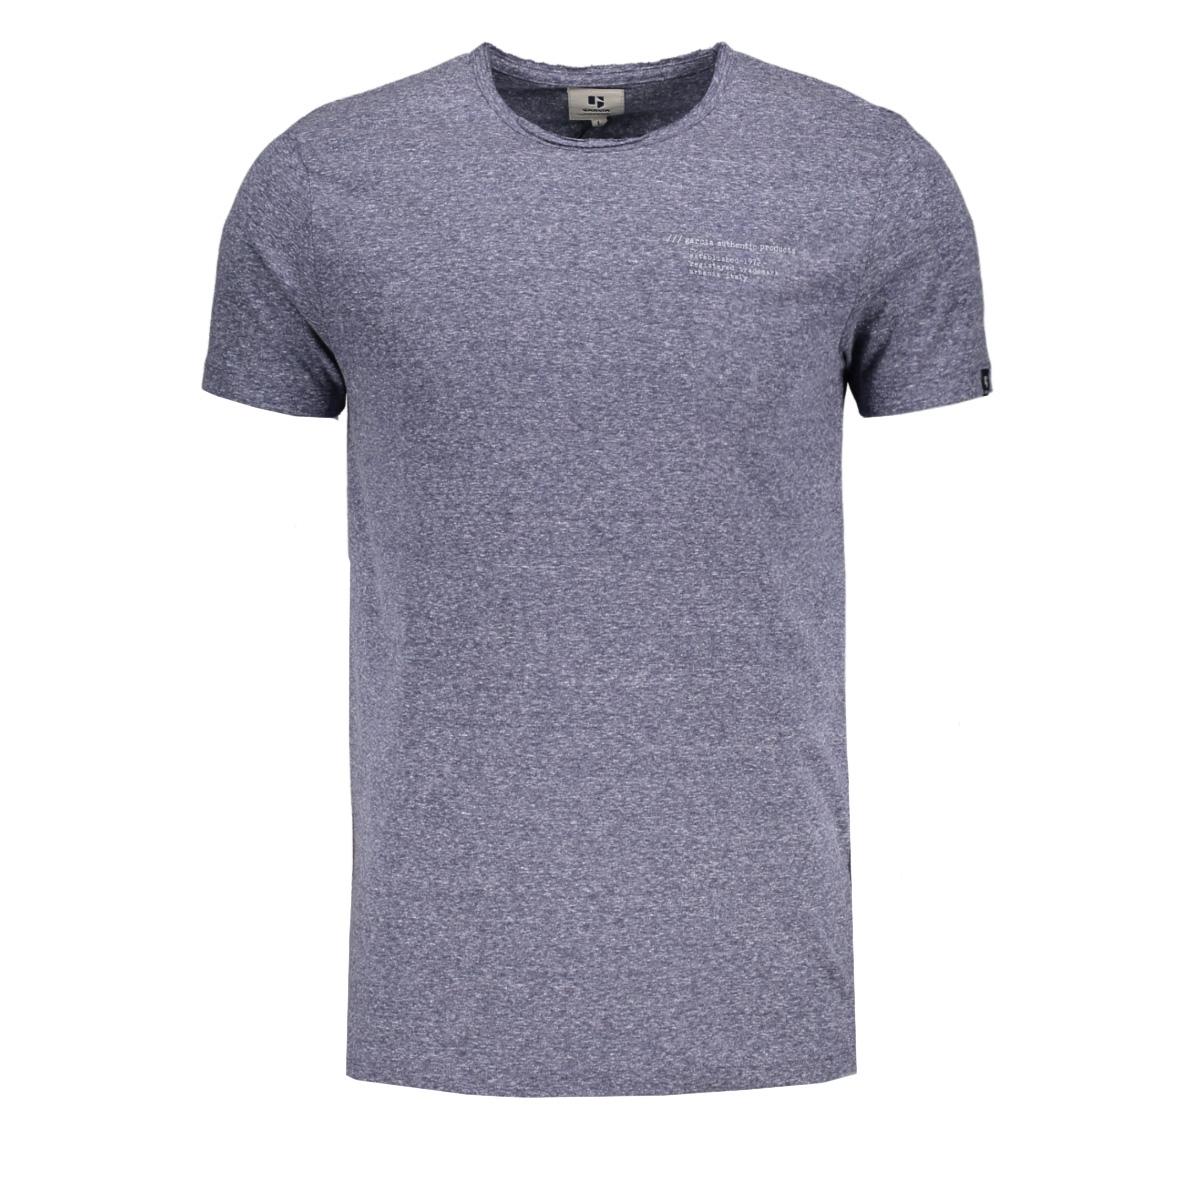 gs910104 garcia t-shirt 70